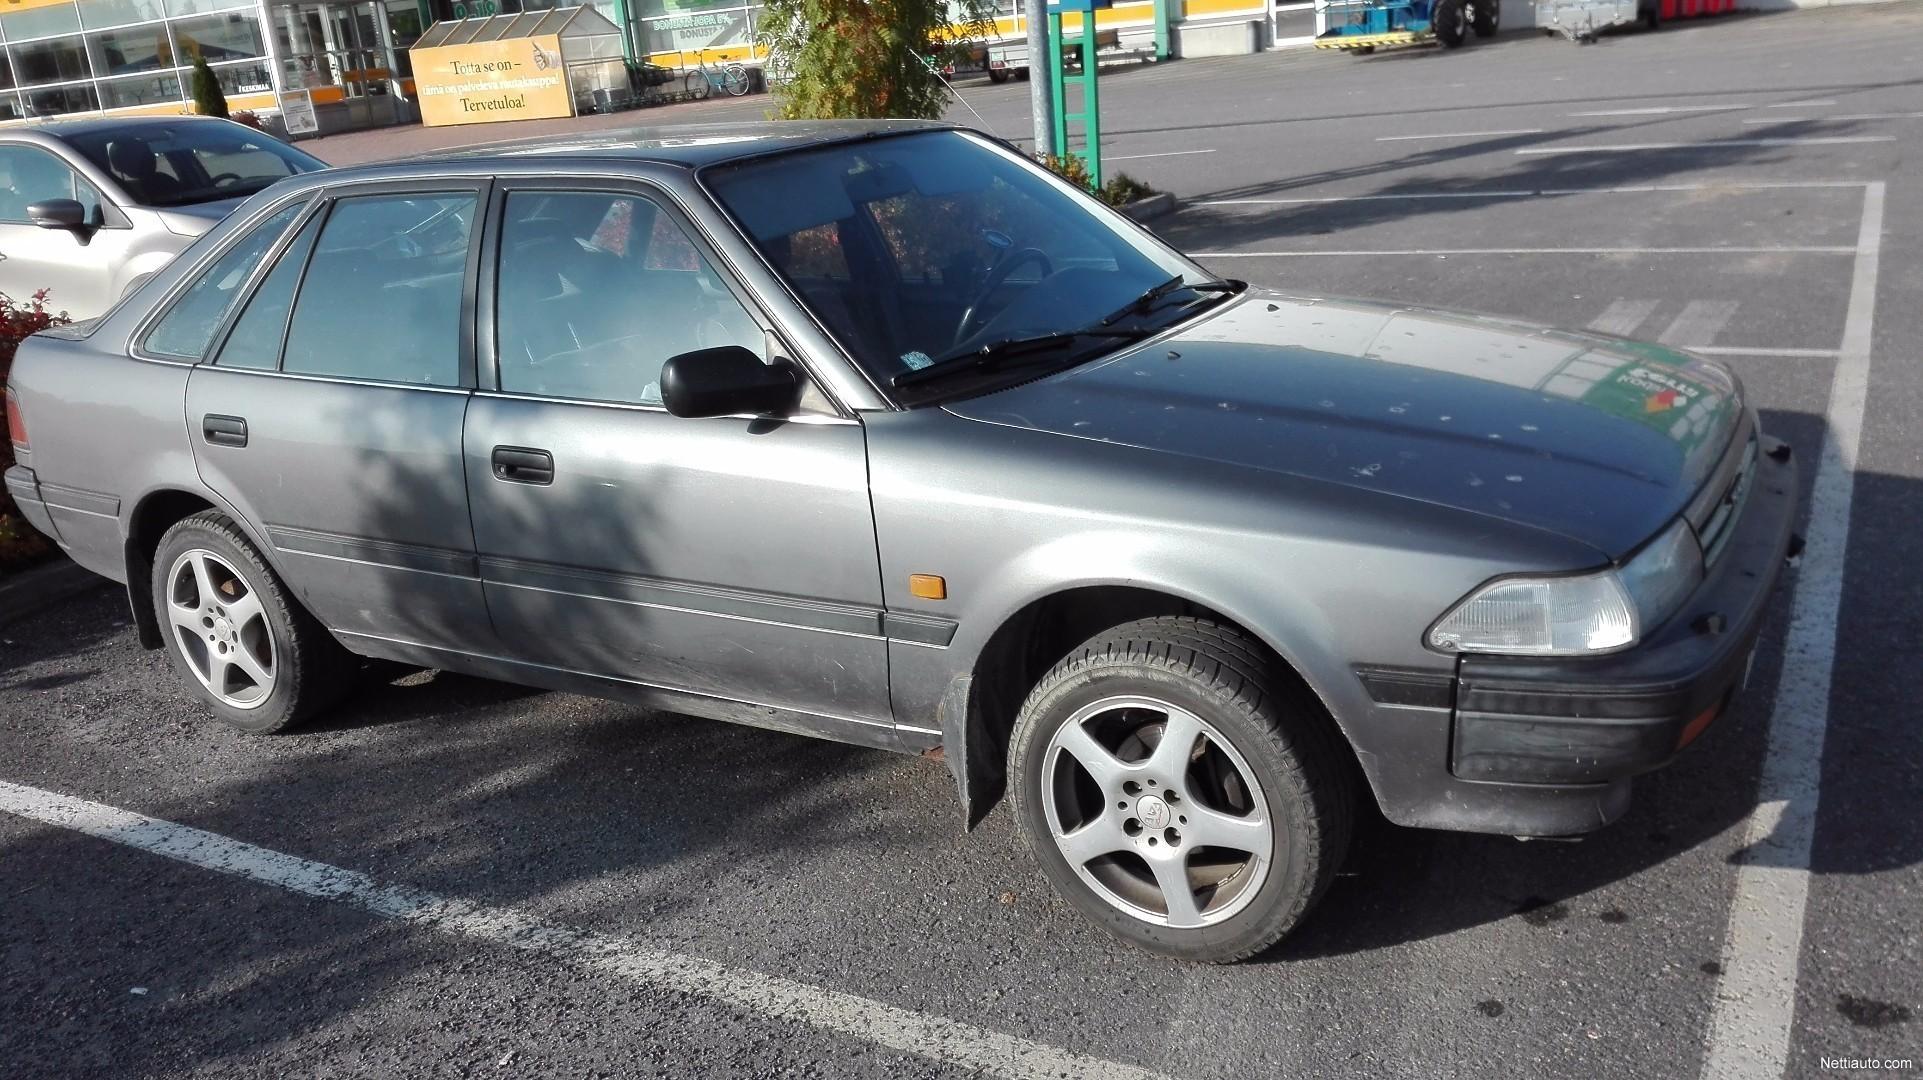 toyota carina ii hatchback 1989 used vehicle nettiauto. Black Bedroom Furniture Sets. Home Design Ideas